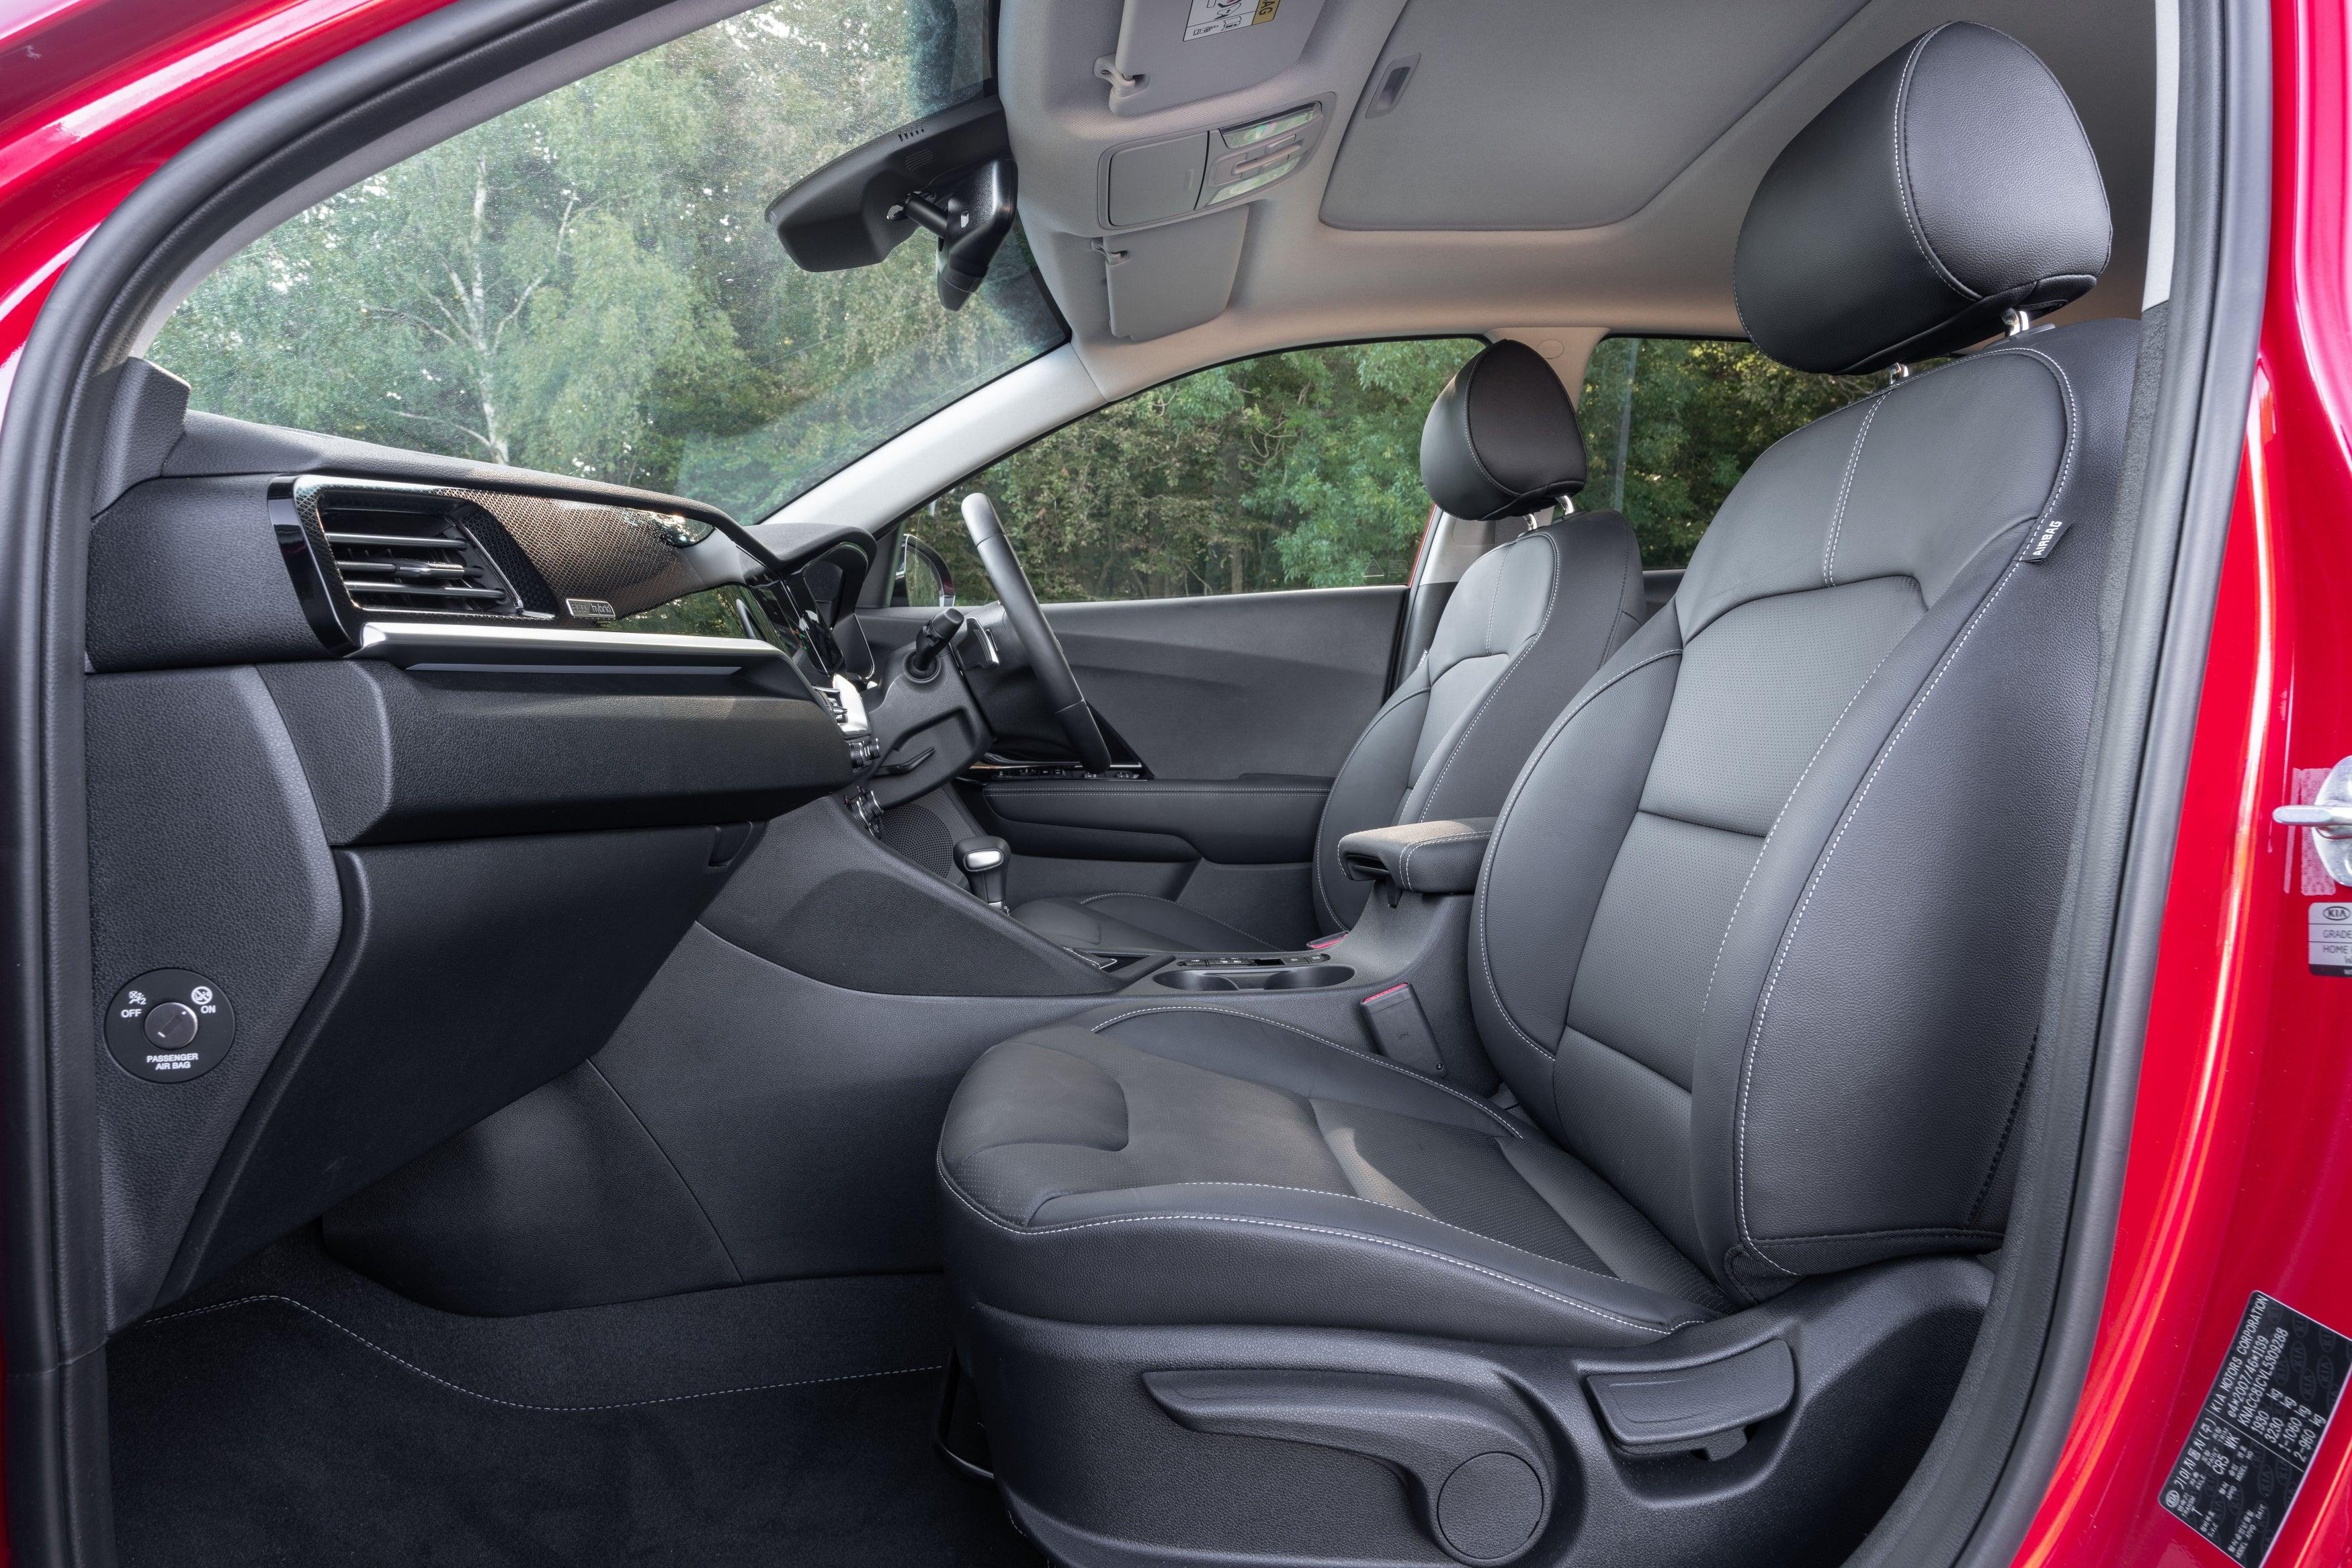 Kia Niro (2016) front interior